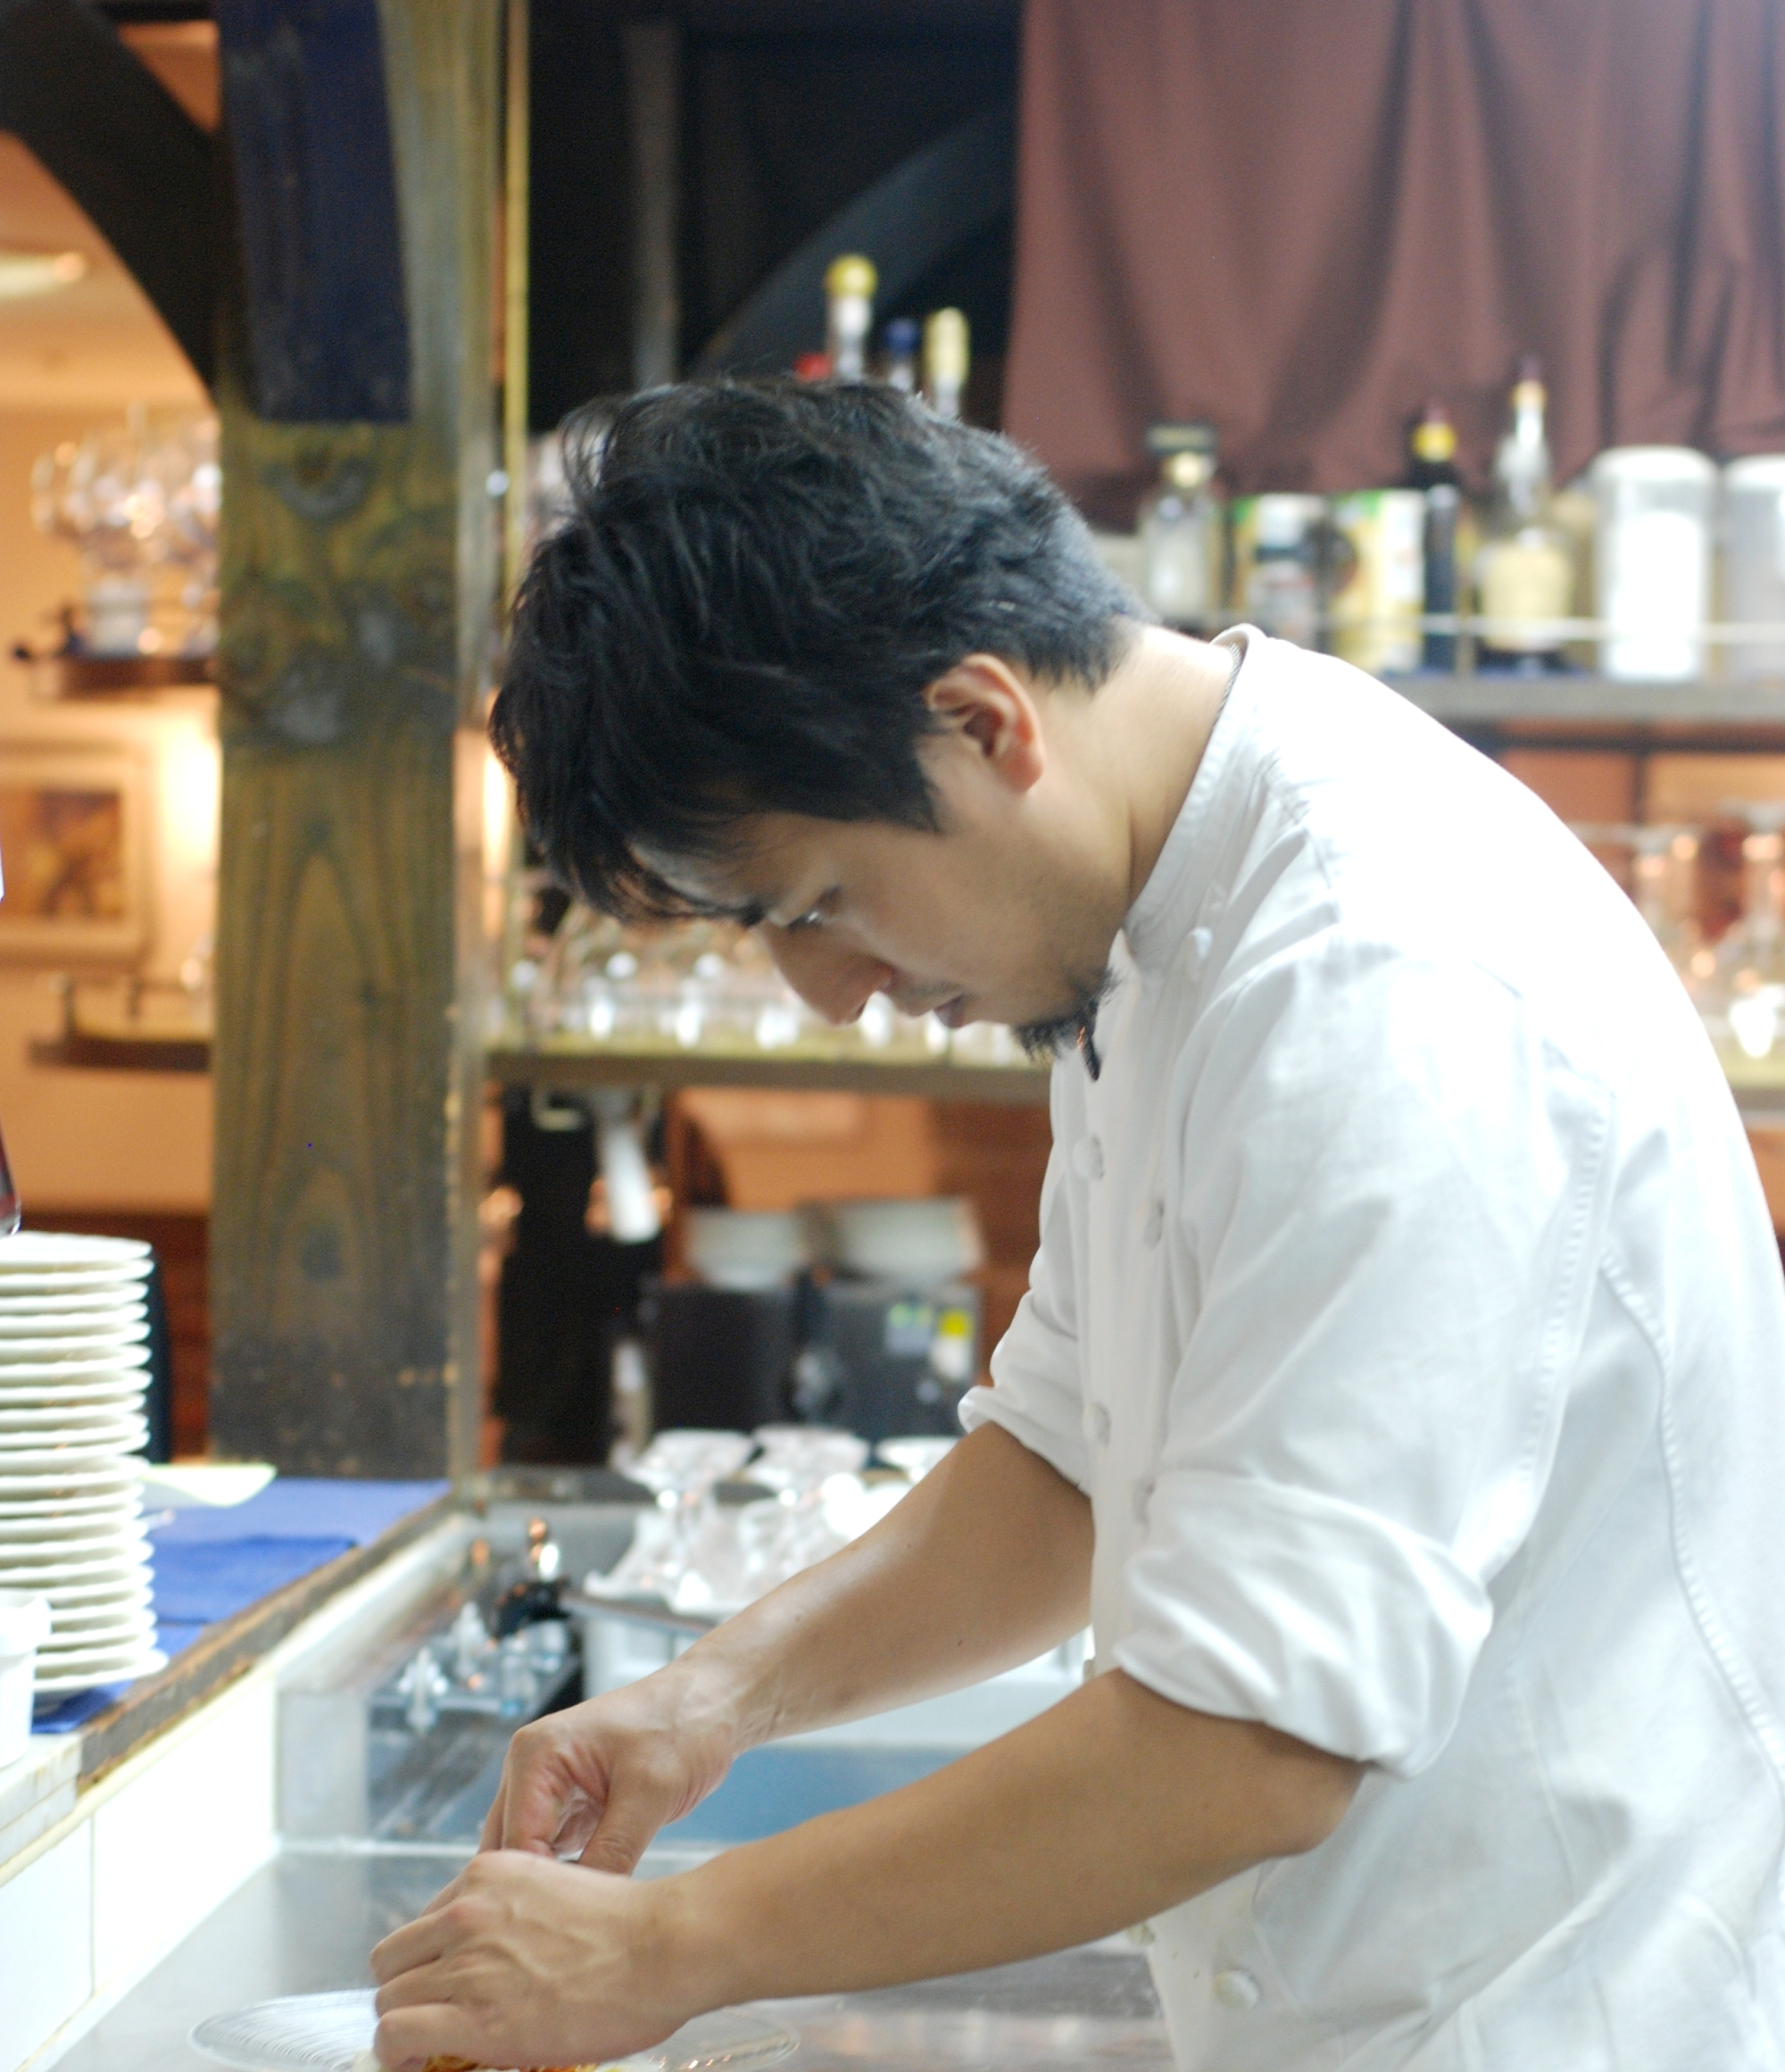 Gaudente Osaka chef